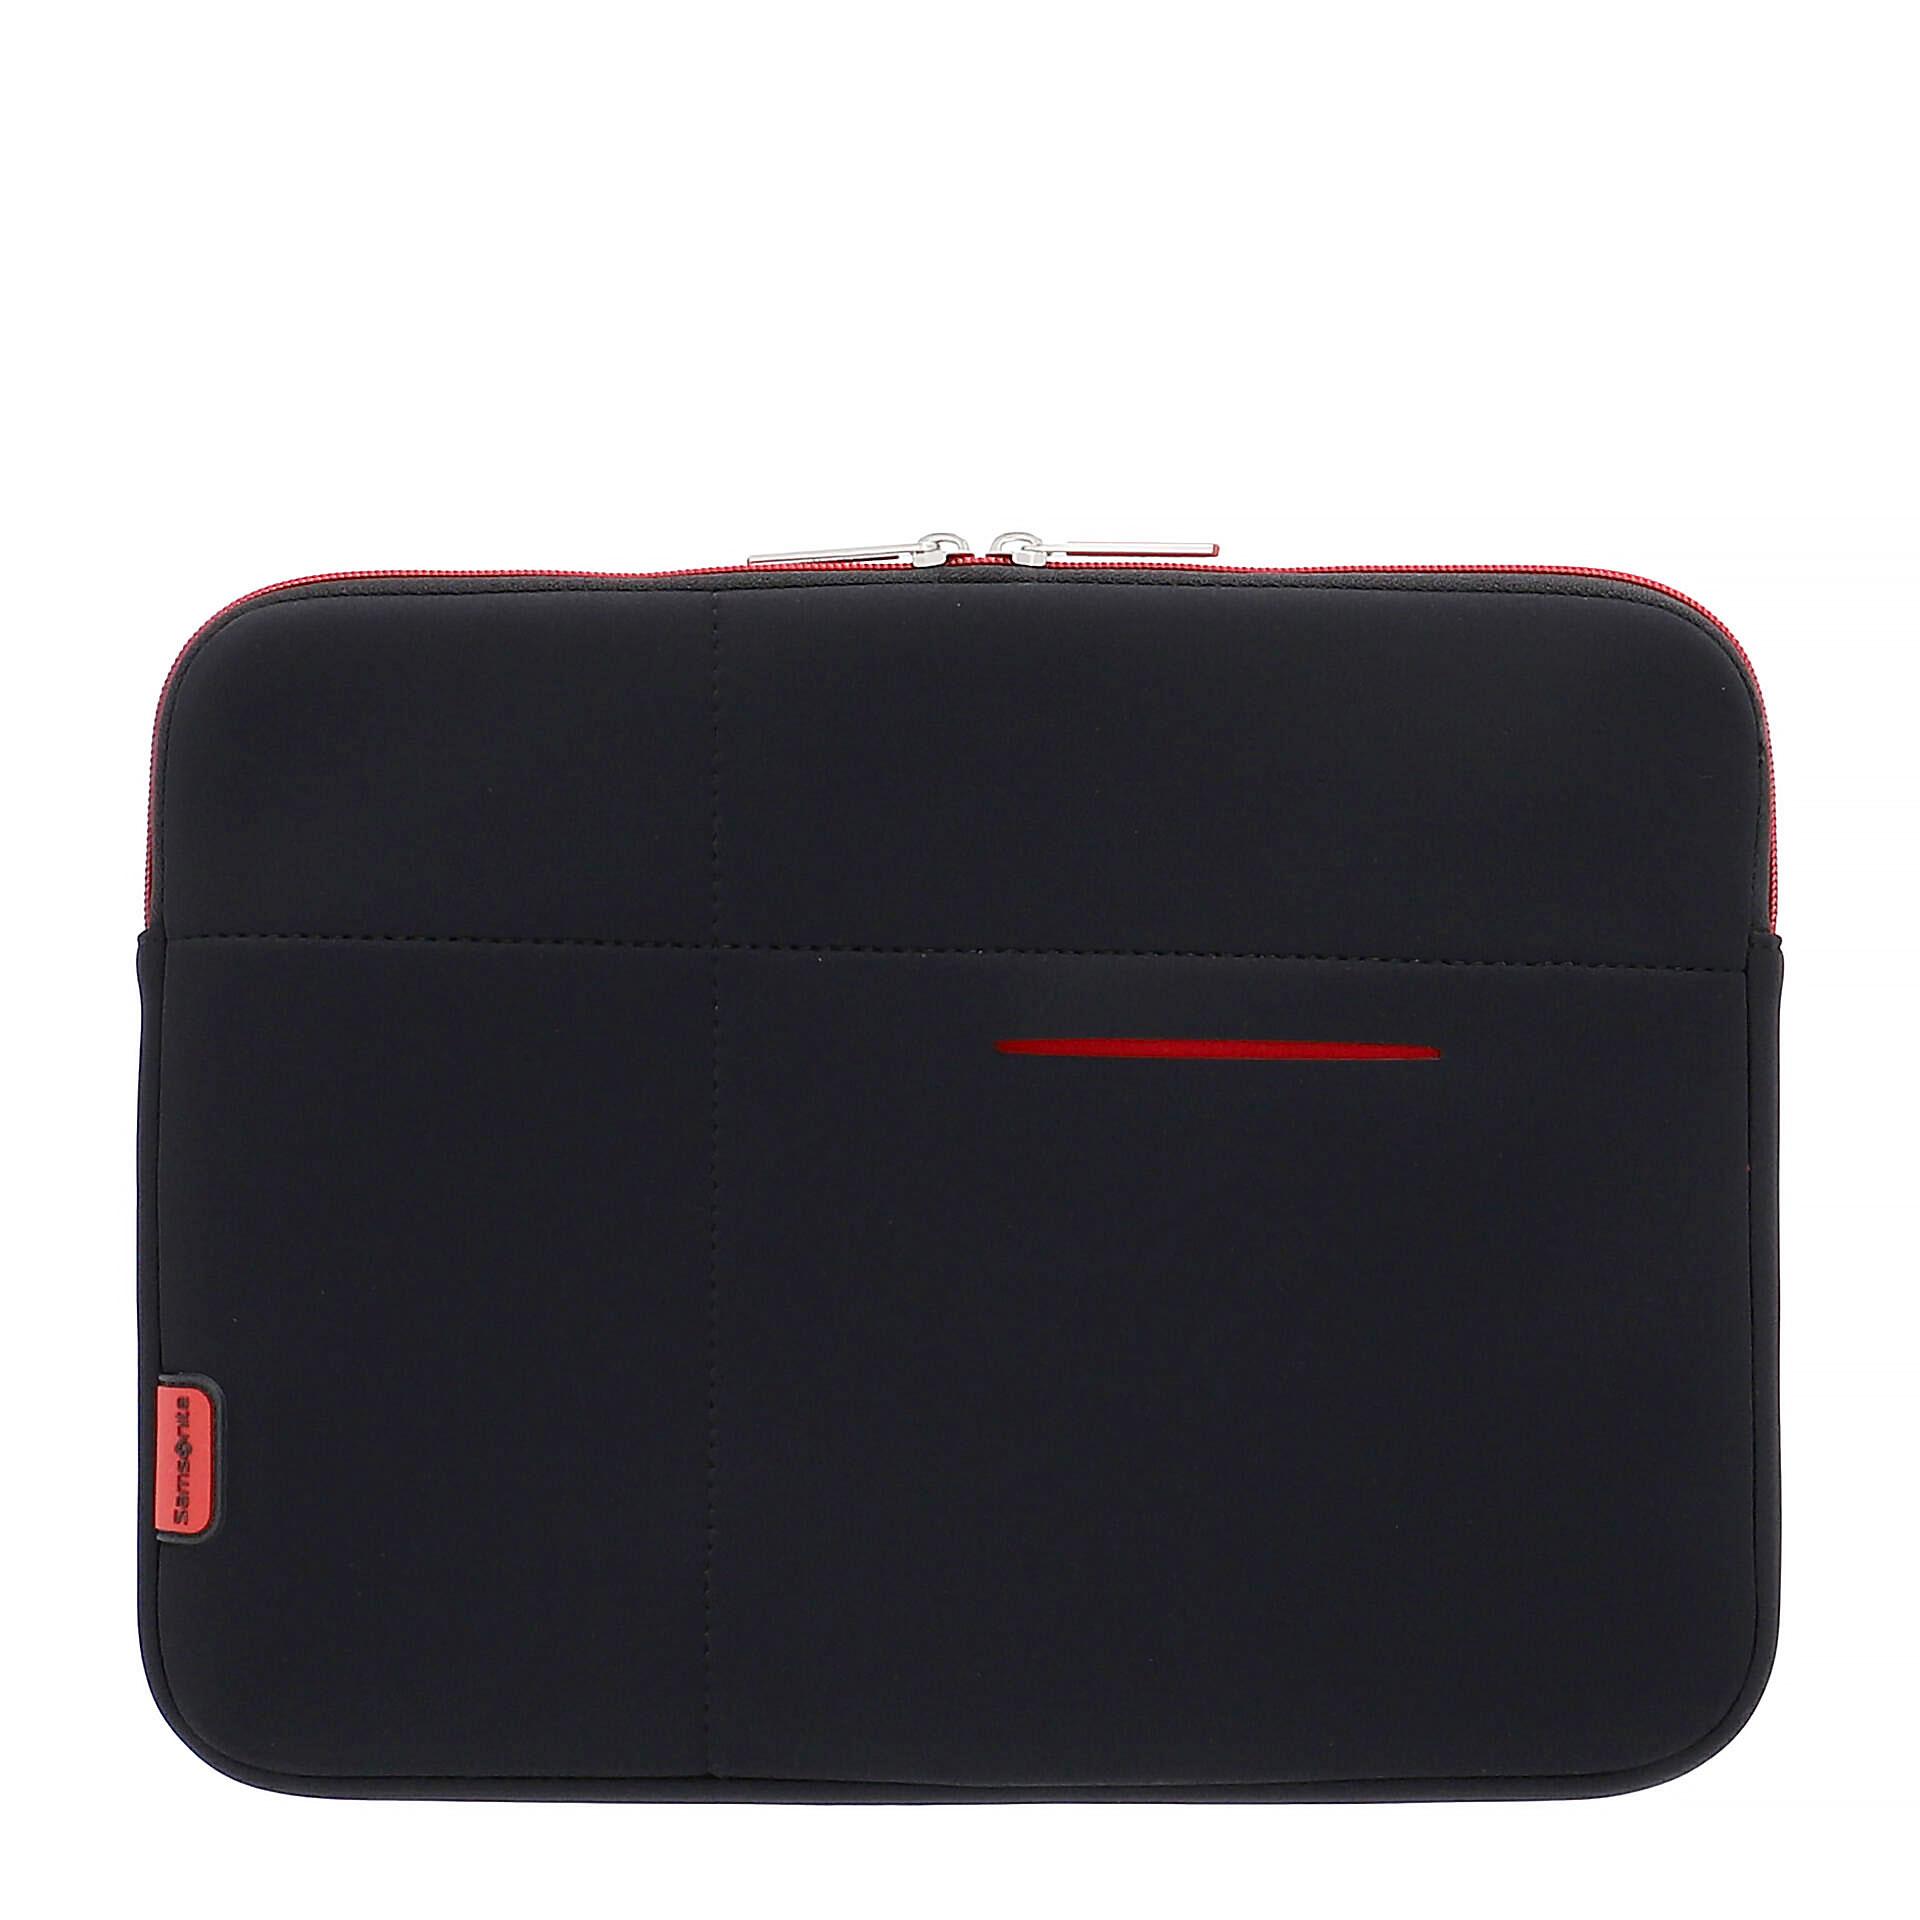 "Samsonite Airglow Laptop Hülle 13.3"" black/red"